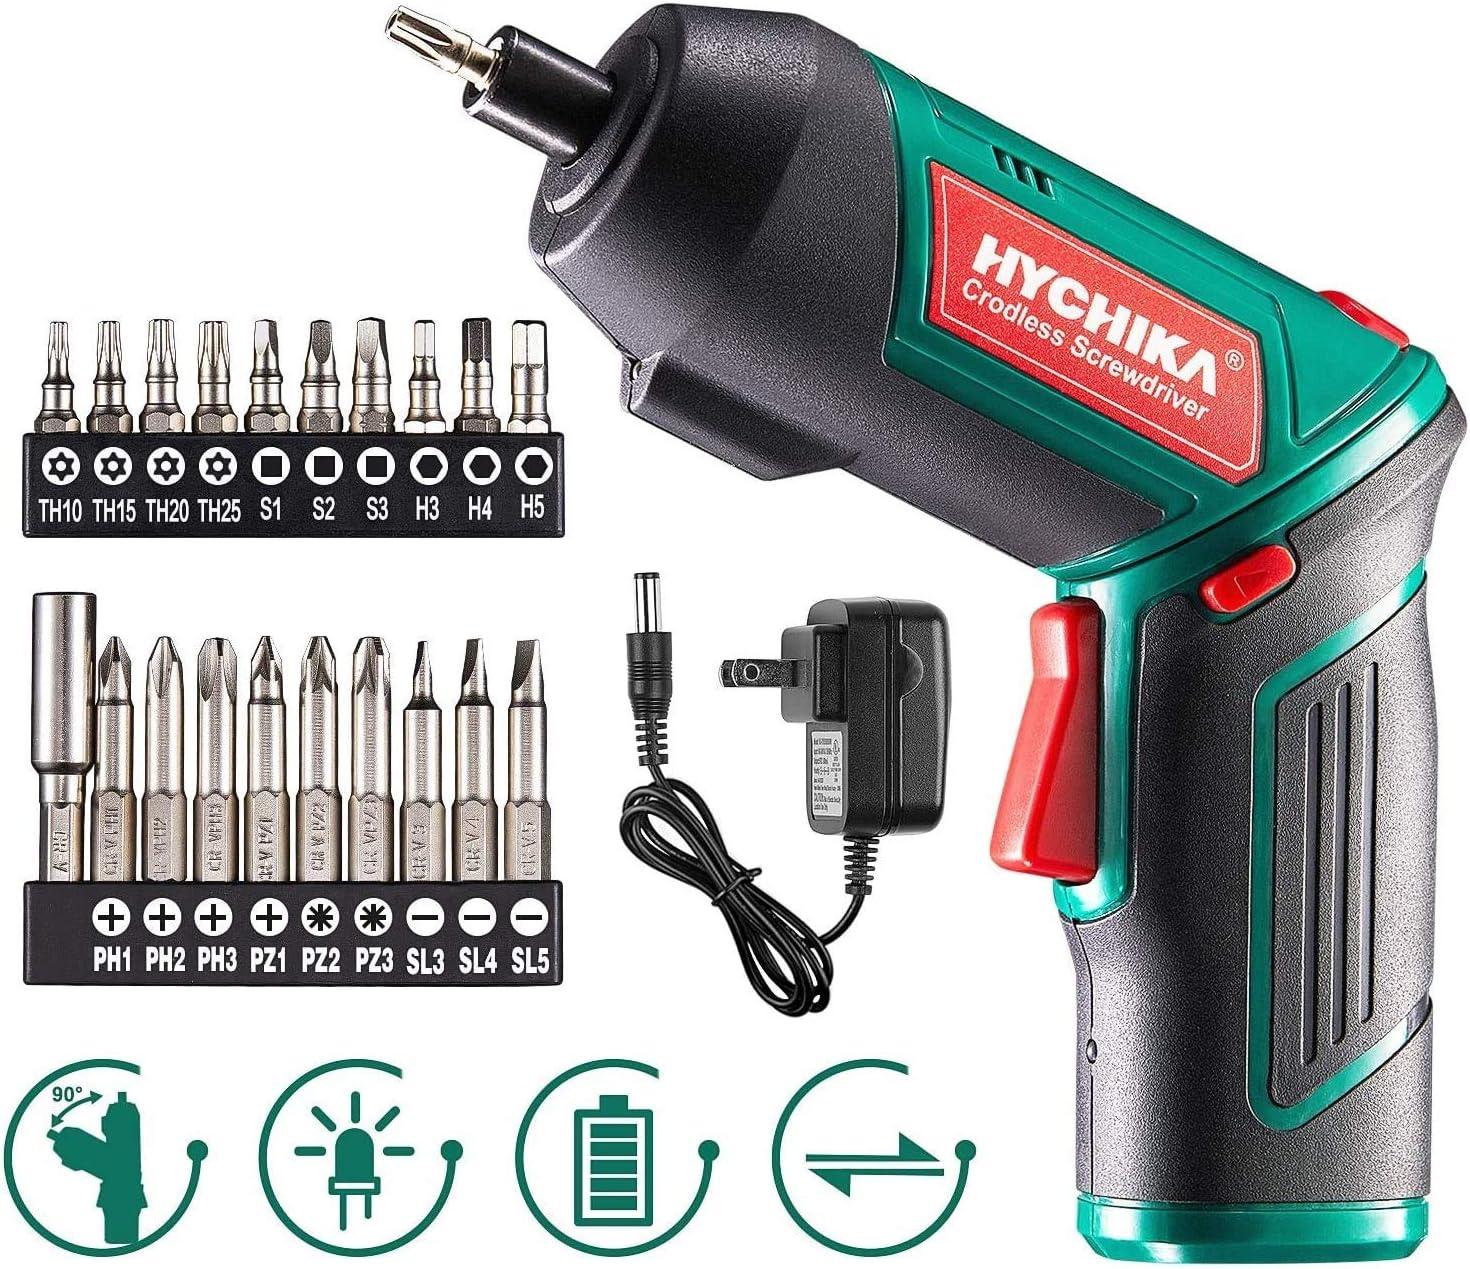 Destornillador Eléctrico 6N.m, HYCHIKA Atornillador Eléctrico Inalámbrico 3.6v Batería 2000mAh (Máximo Par 6 N.m) LED Luz, Mandril Magnético, Cargador con Cable 3.5mm, 20 Accesorios